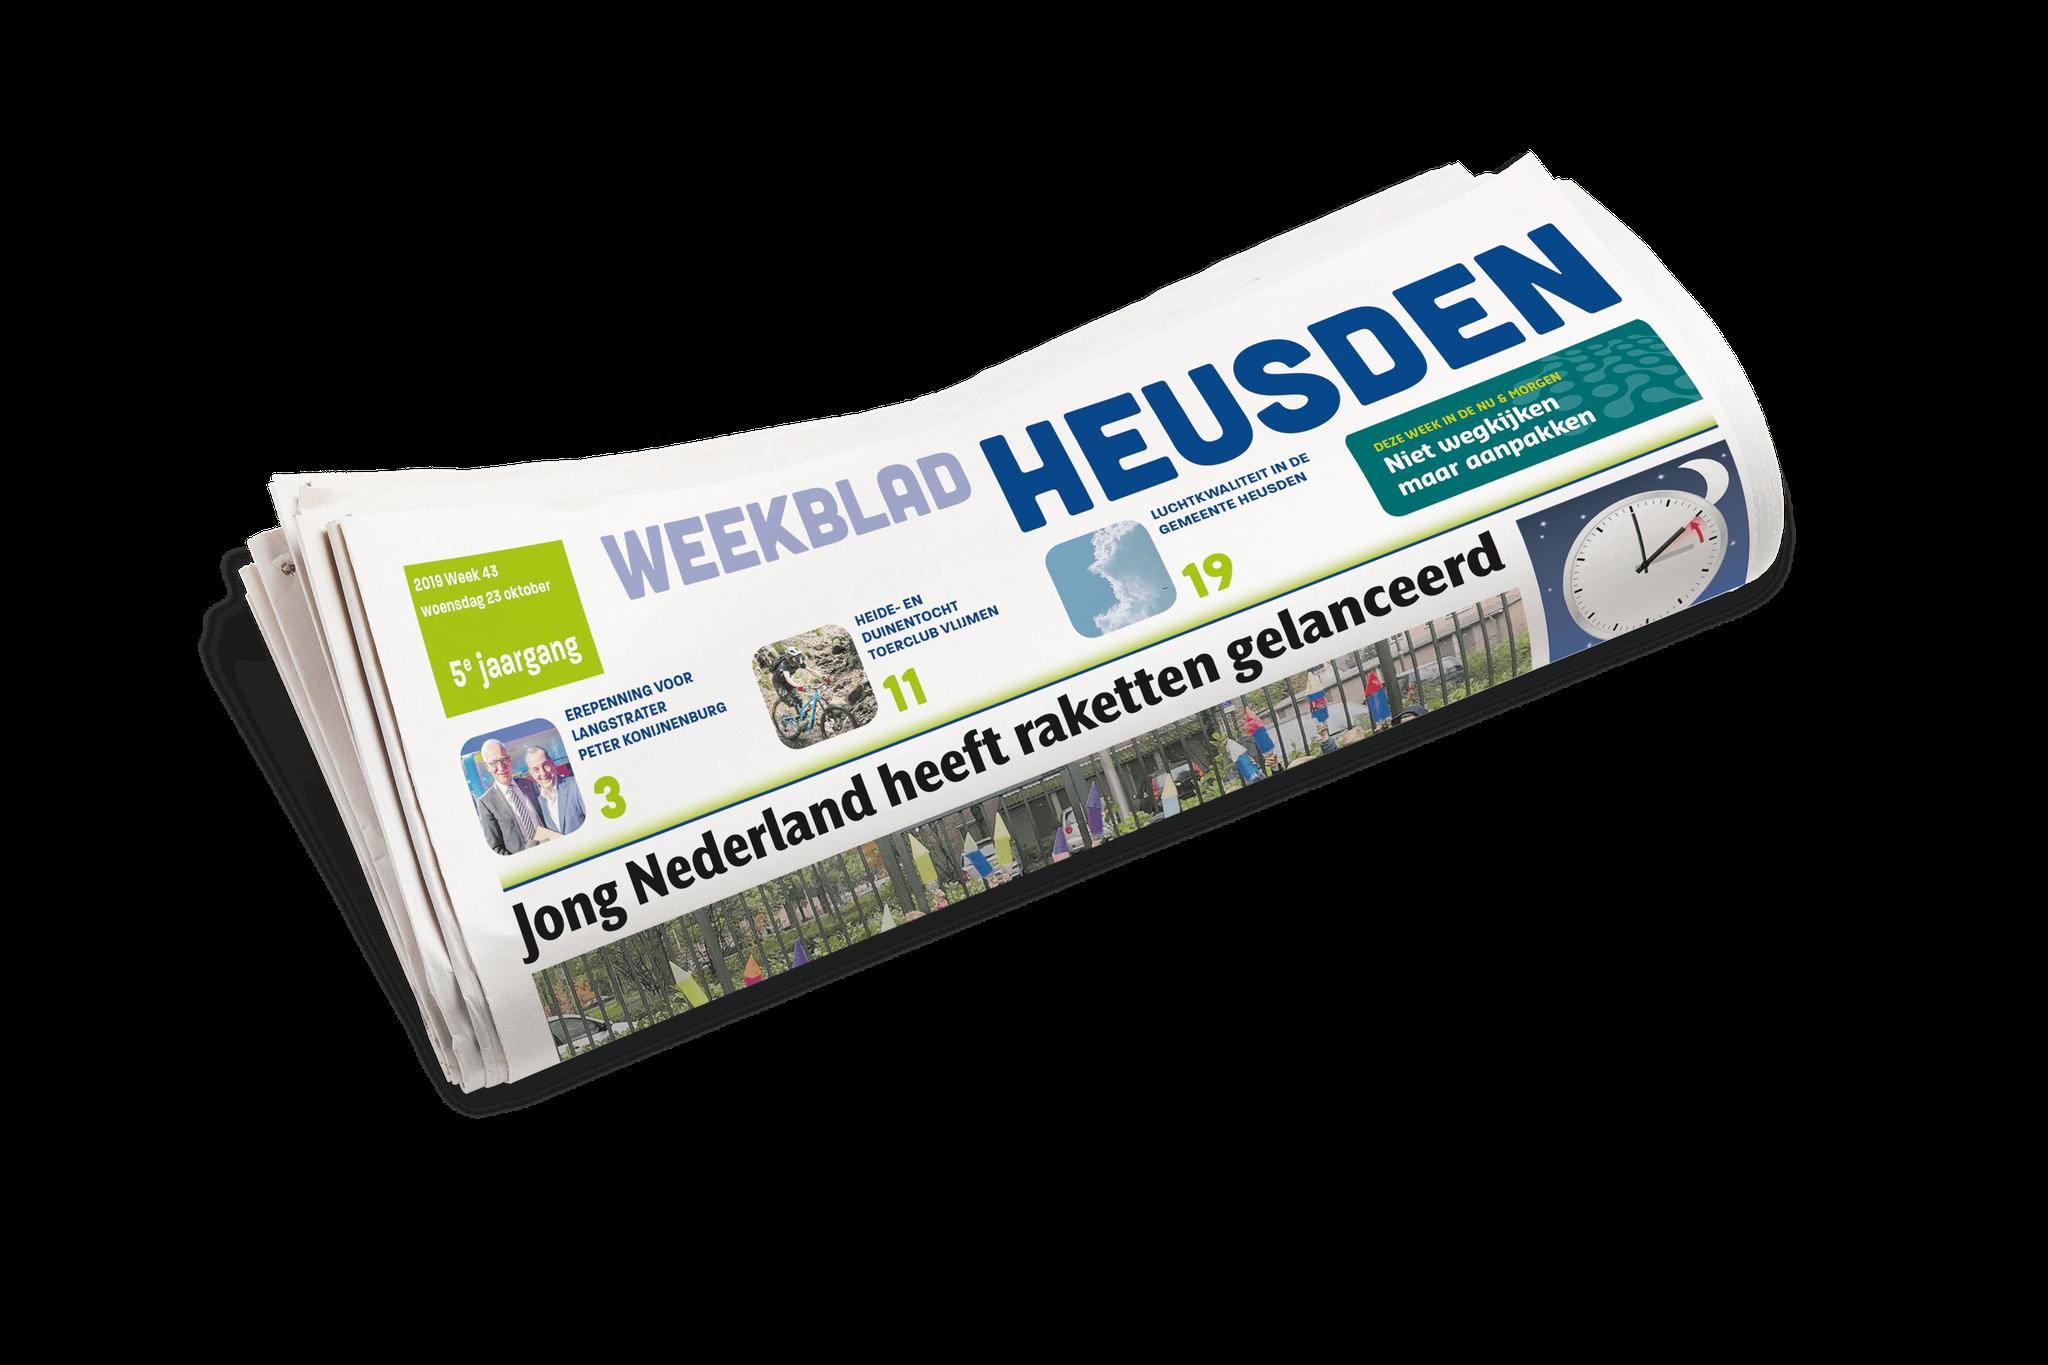 Weekblad Heusden